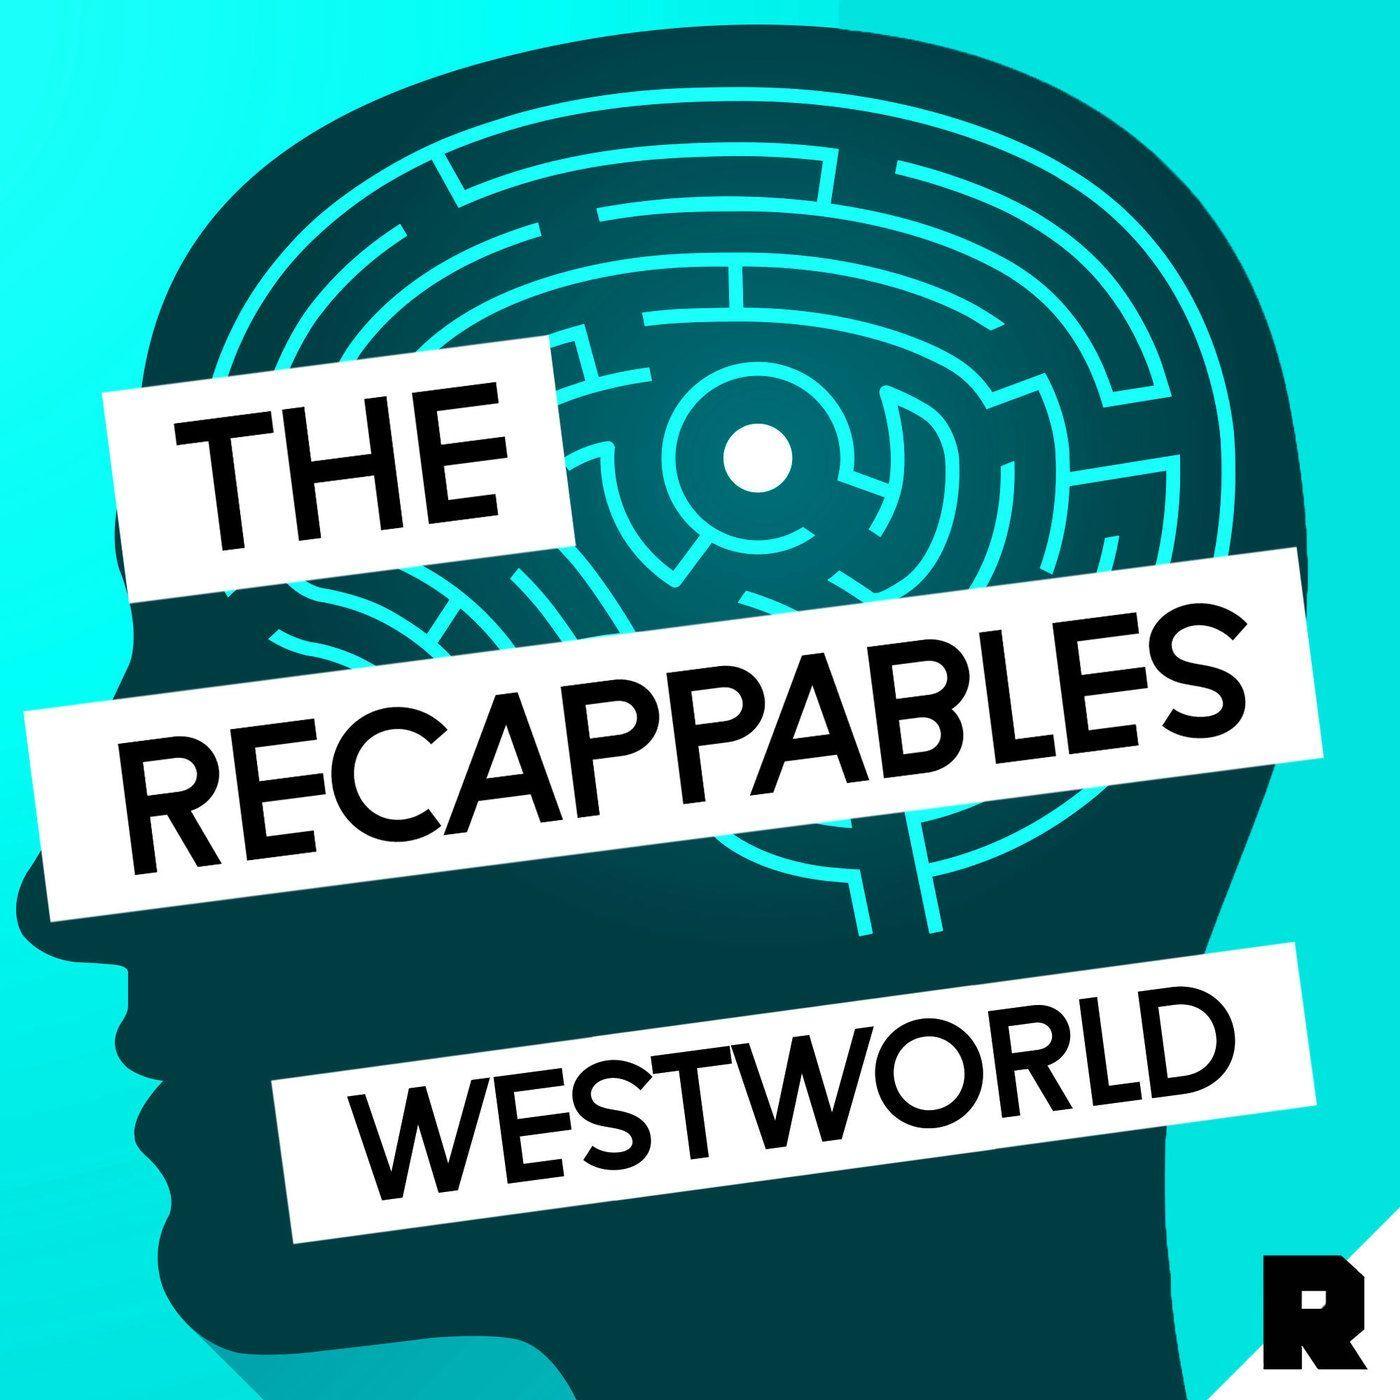 'Westworld' S1 Recap